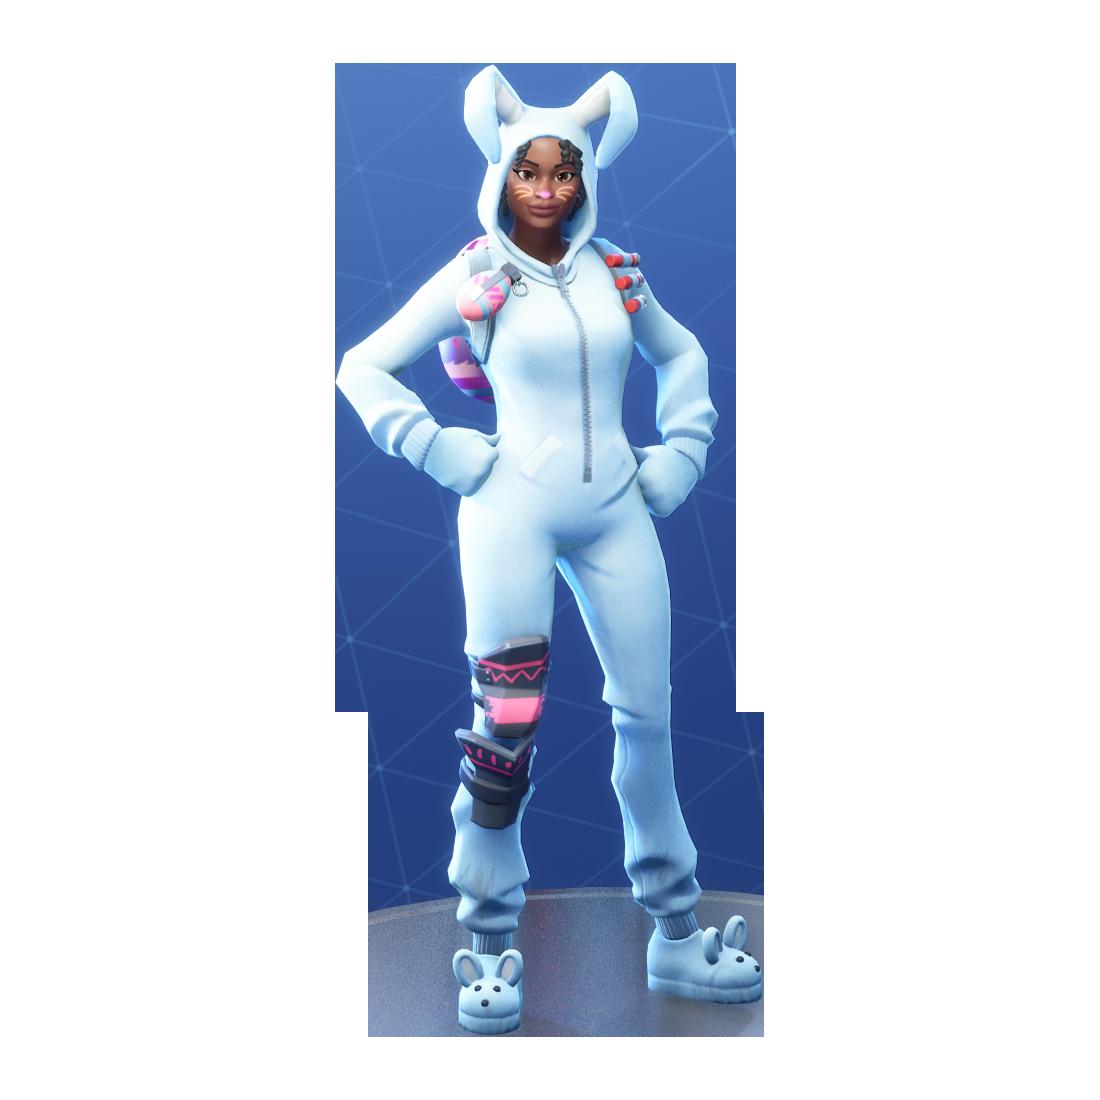 Bunny Brawler - Bunny Brawler (Крутая крольчиха)